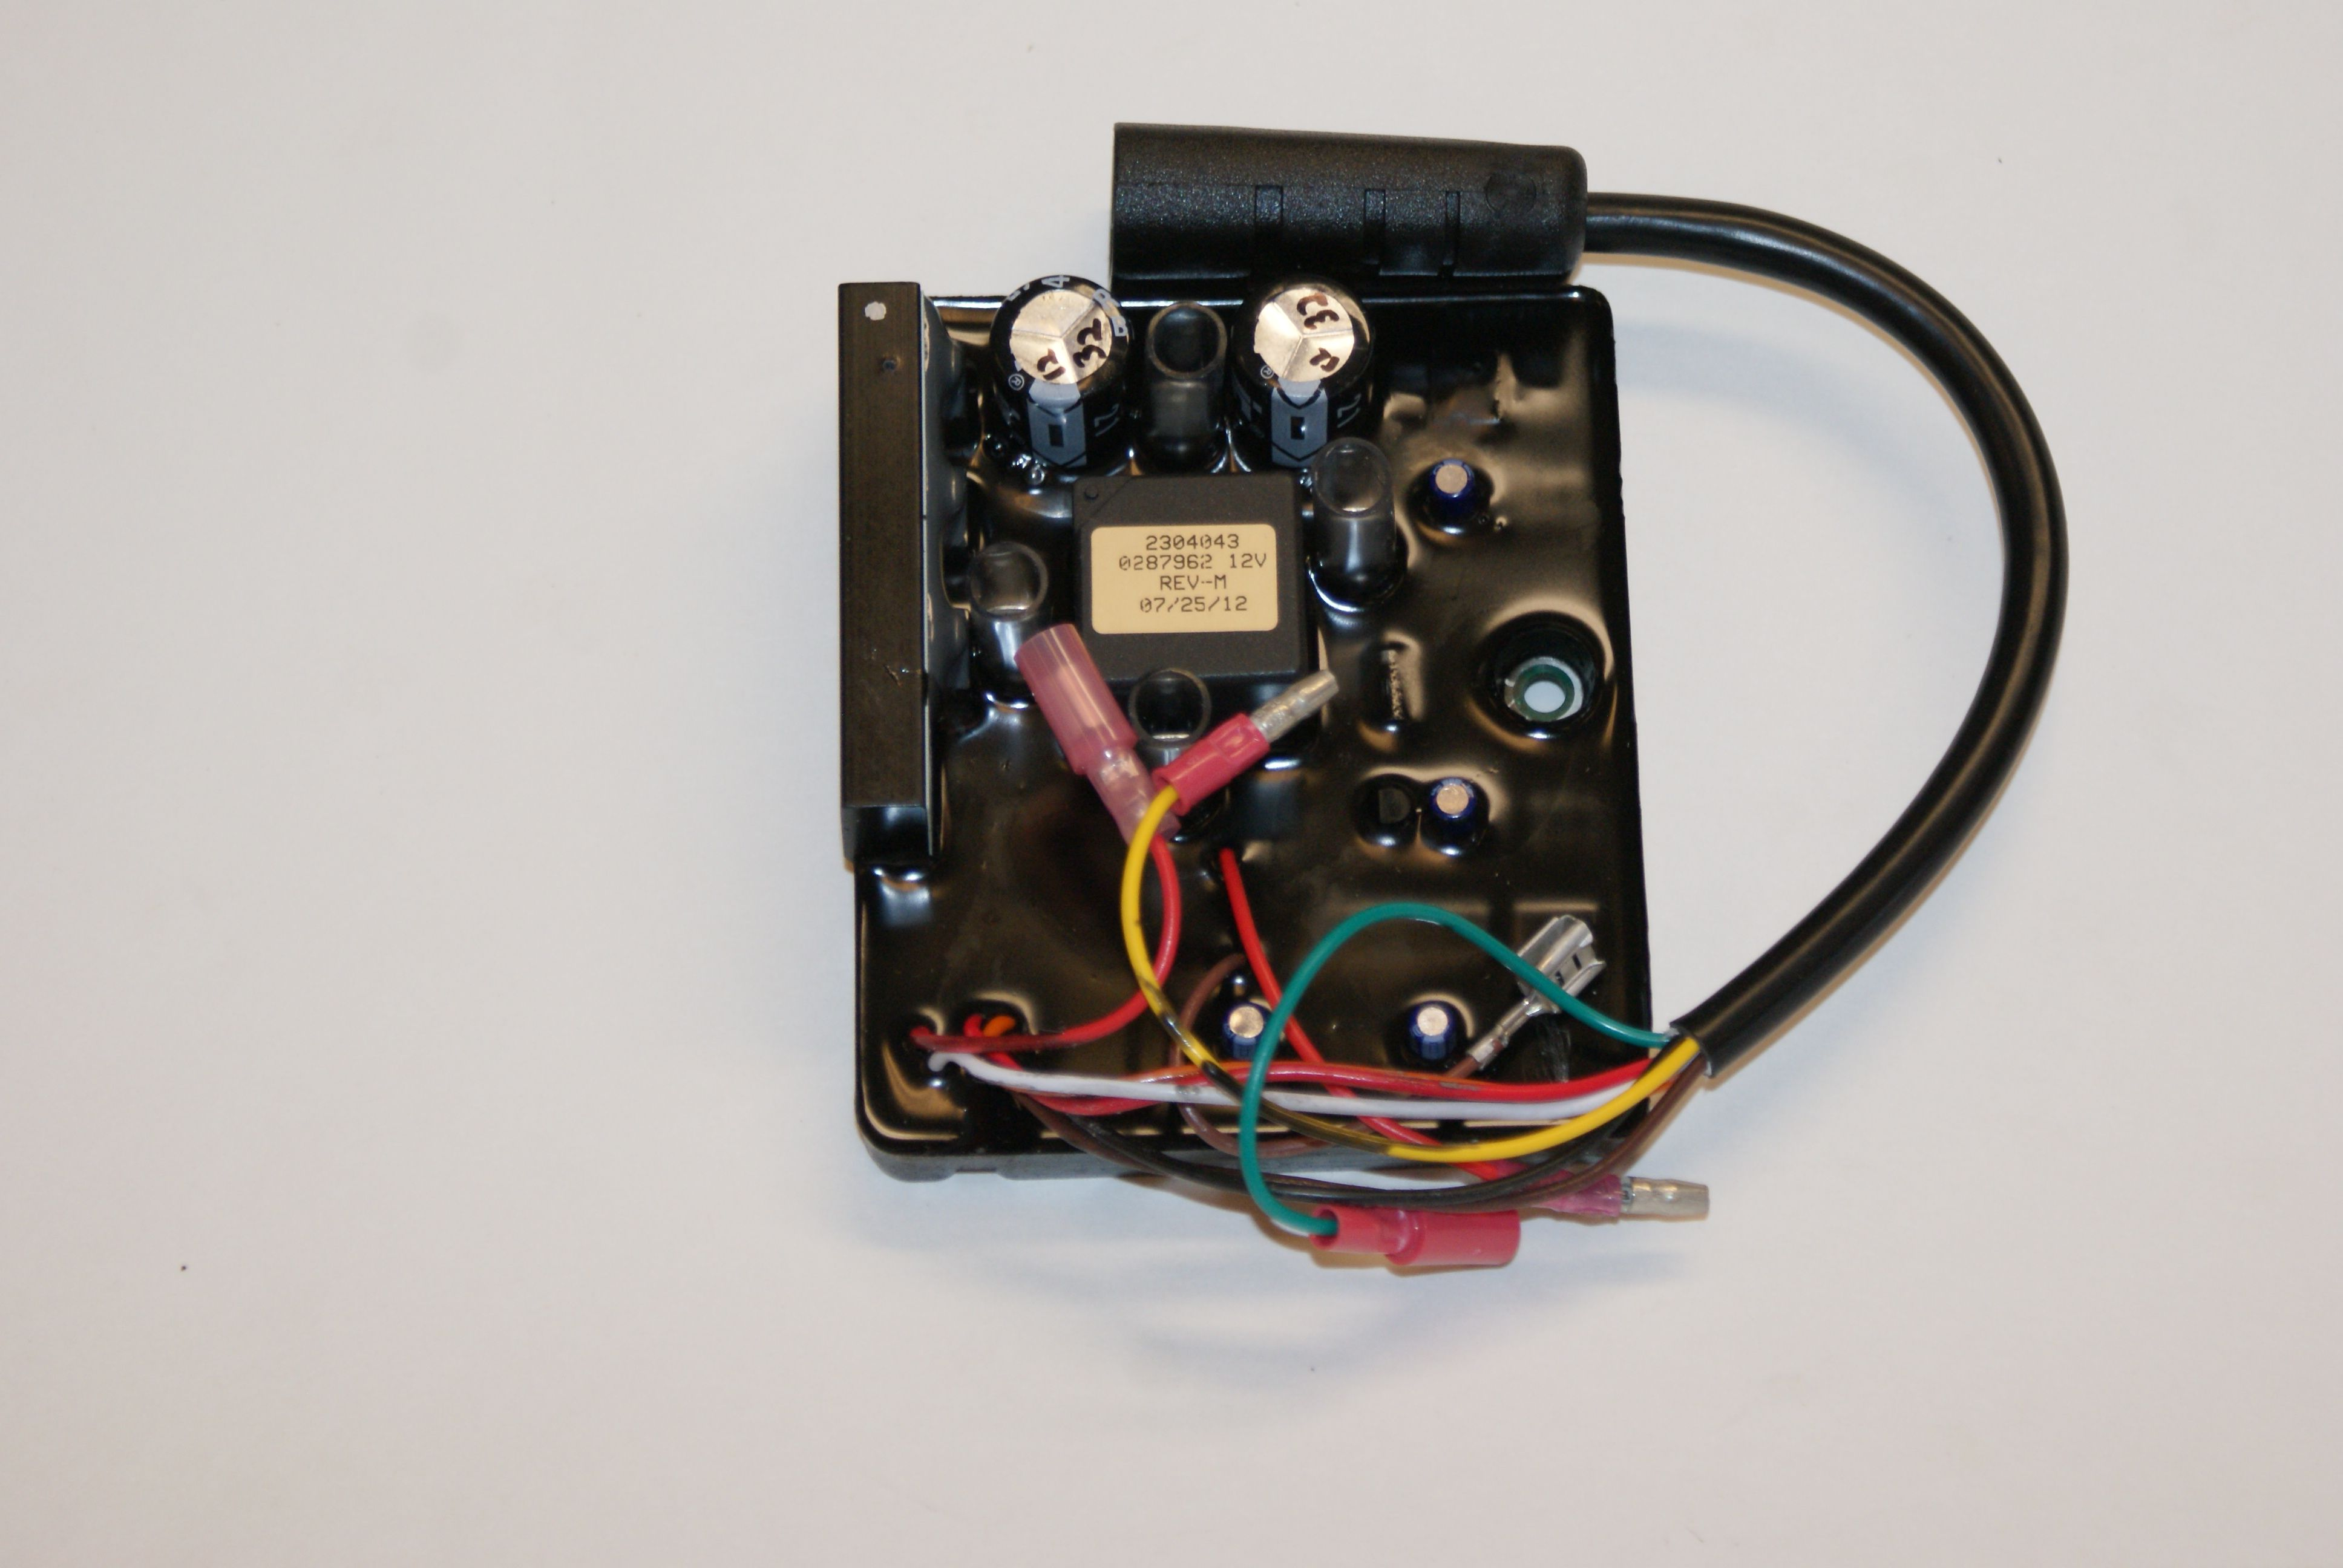 control board for legacy minn kota power drive bow mounts